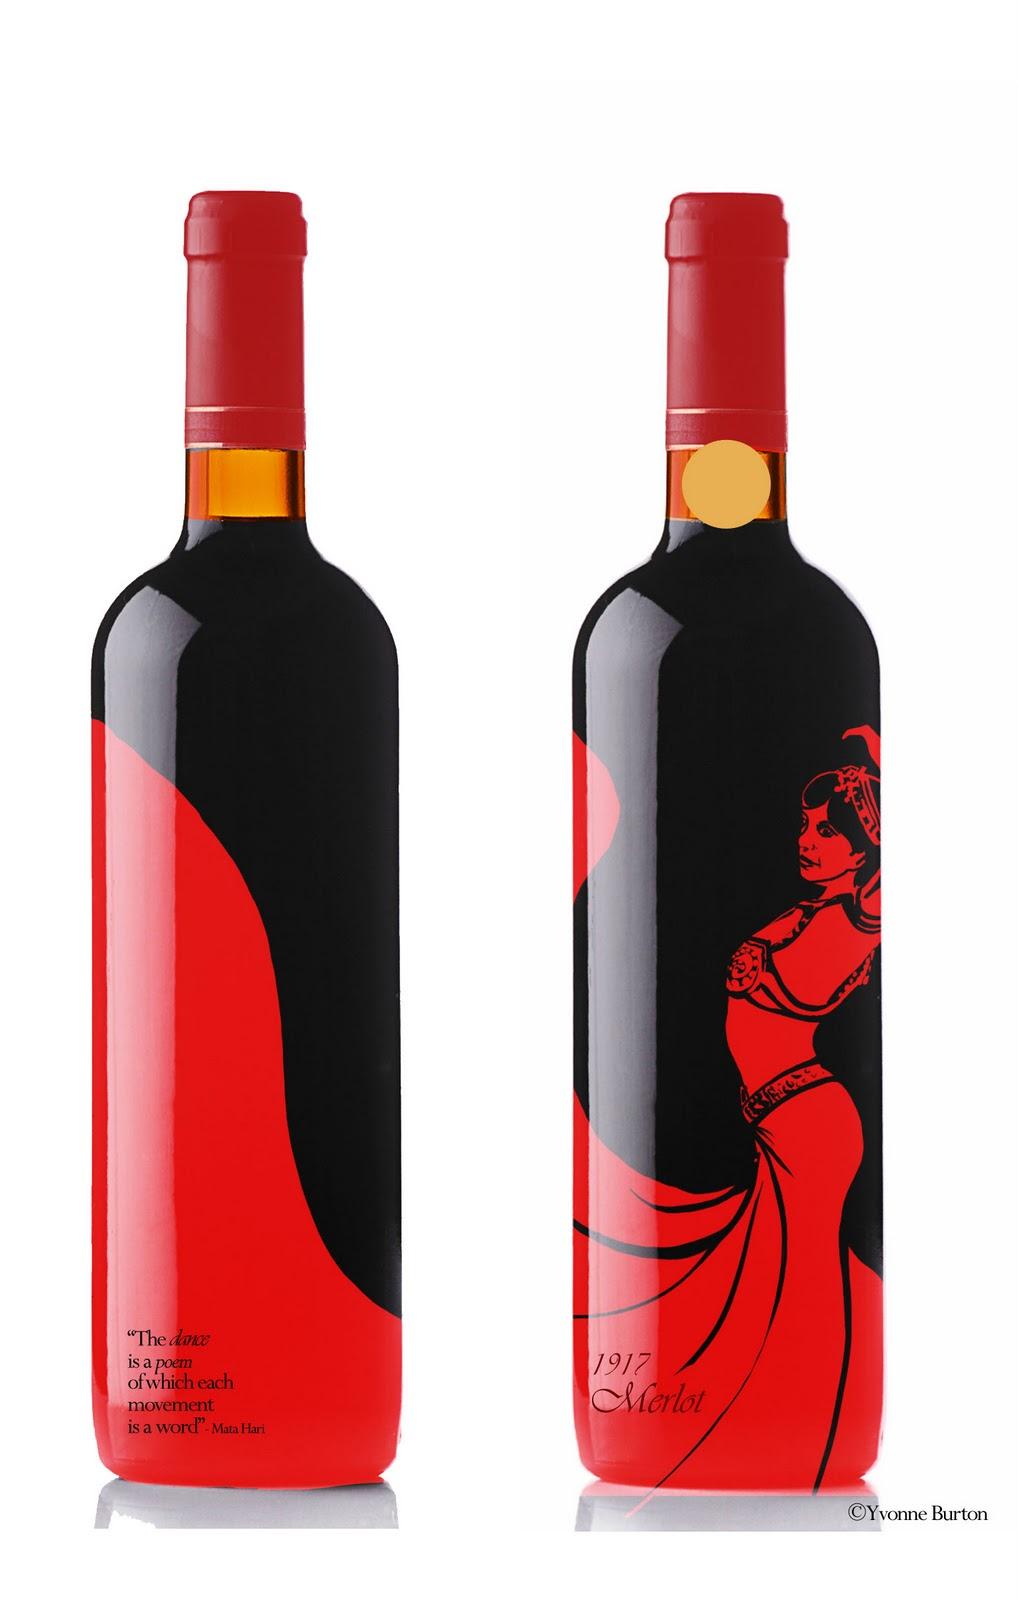 Spy Wine Bottle Design | Artistic Inception